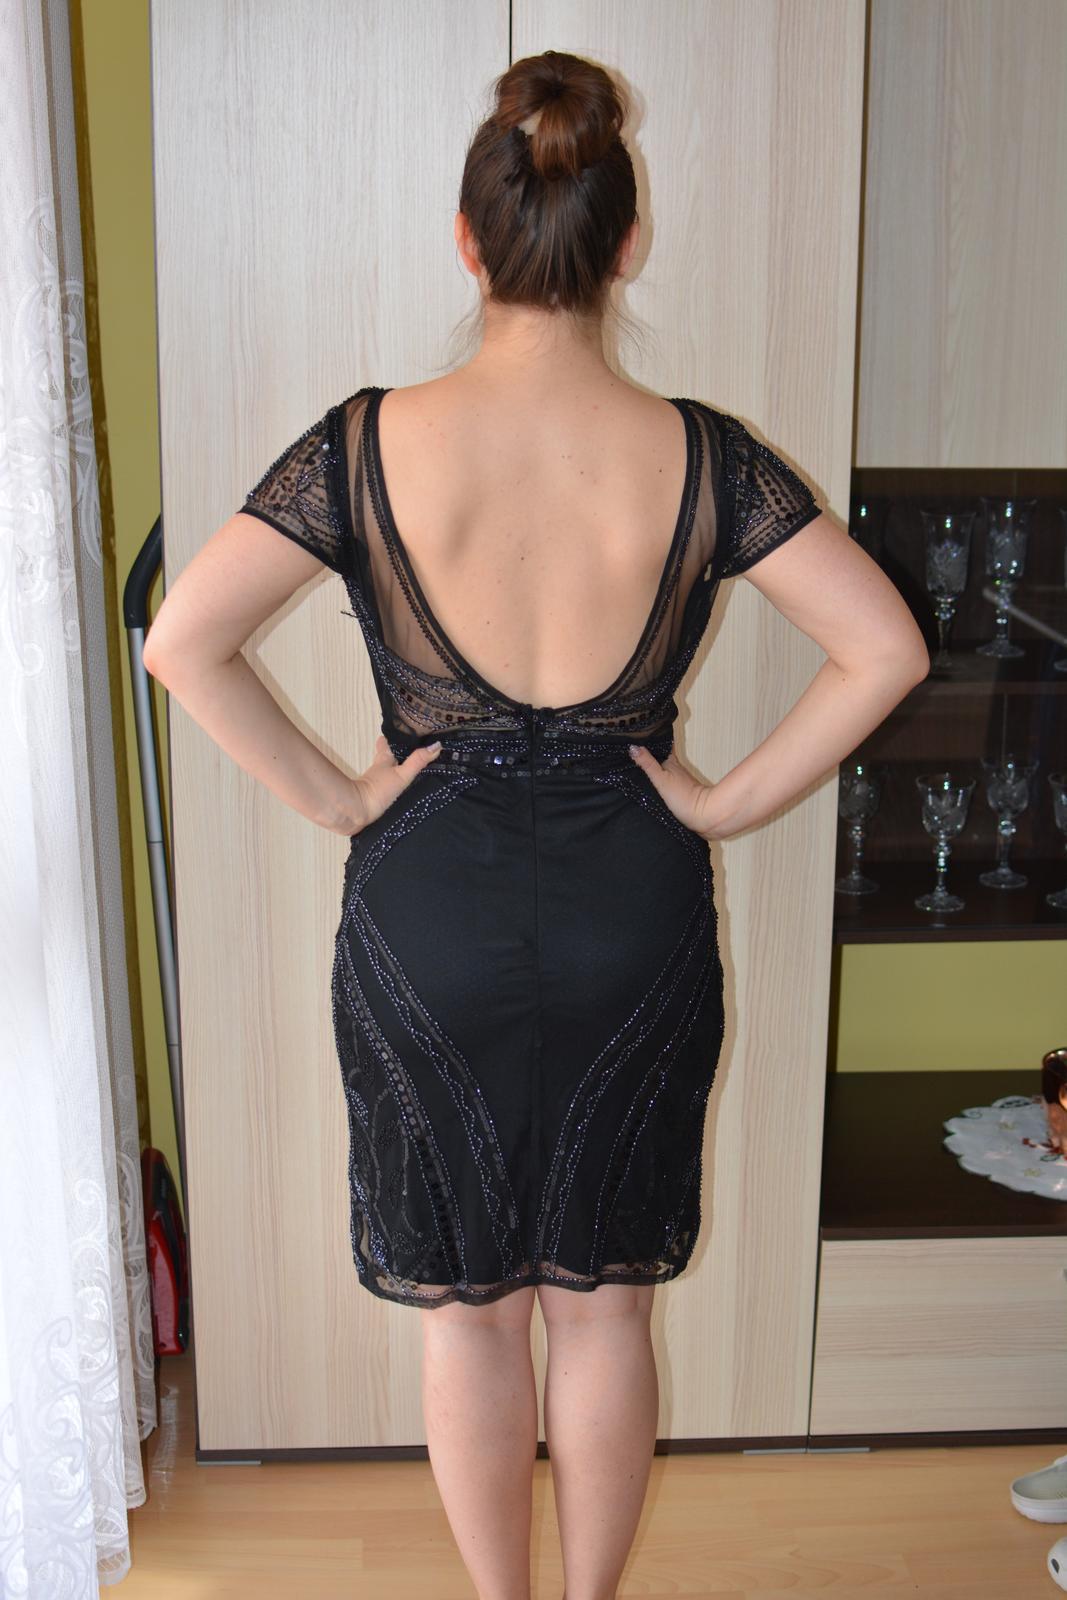 Nepoužité šaty s holým chrbtom a podprsenkou 487ea5e3d39